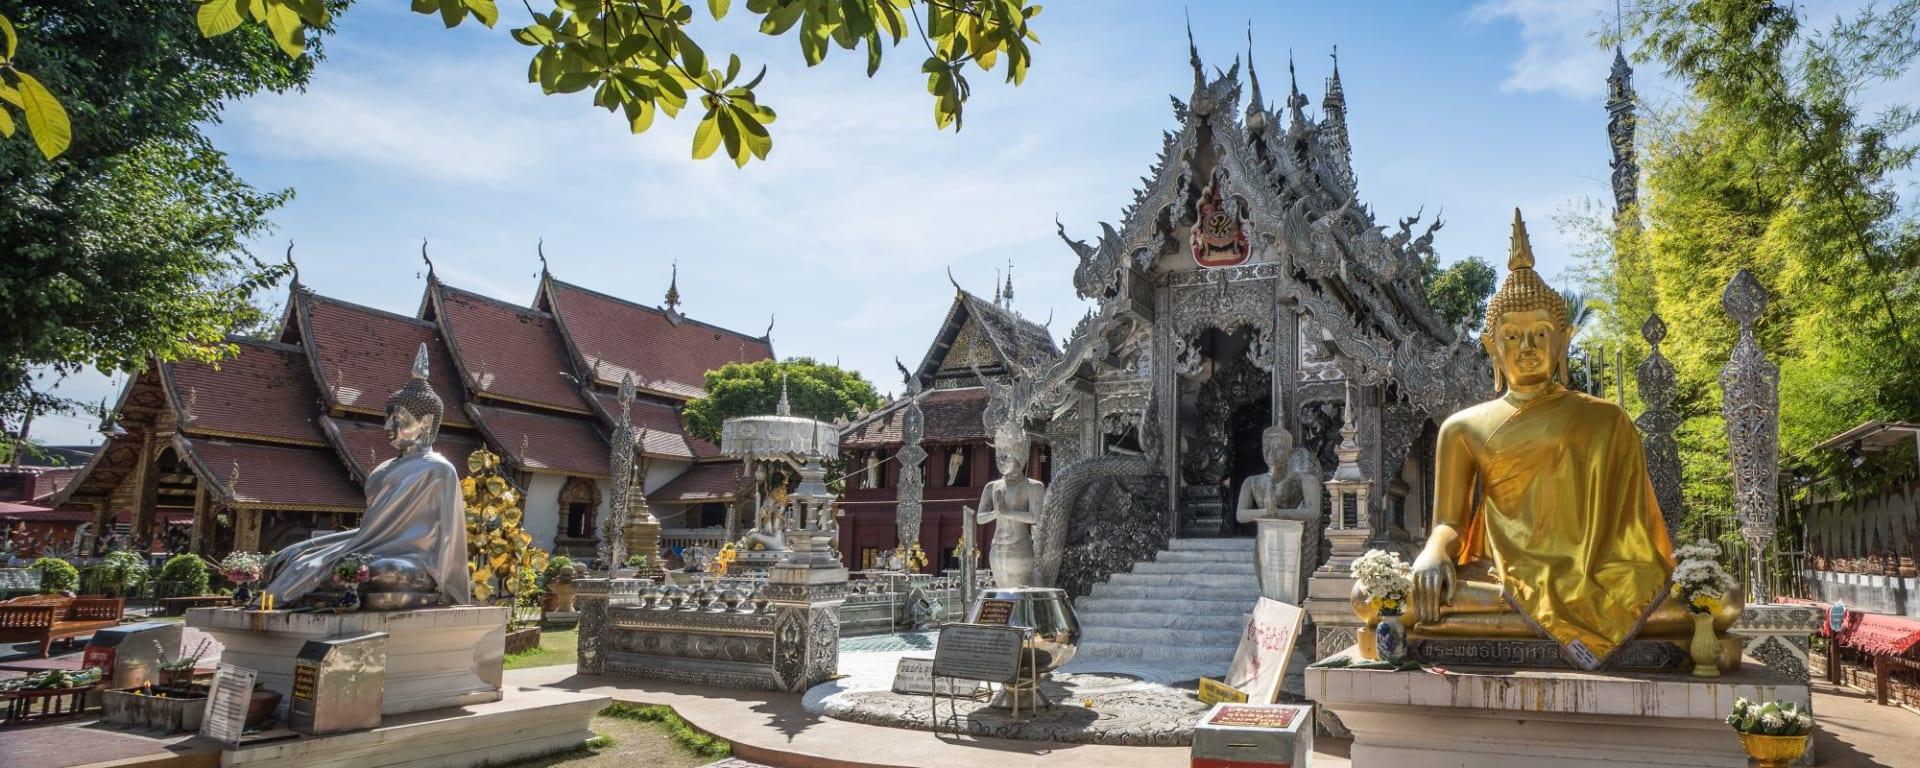 Königliches Siam ab Bangkok: Chiang Mai Silver Temple Wat Sri Suphan